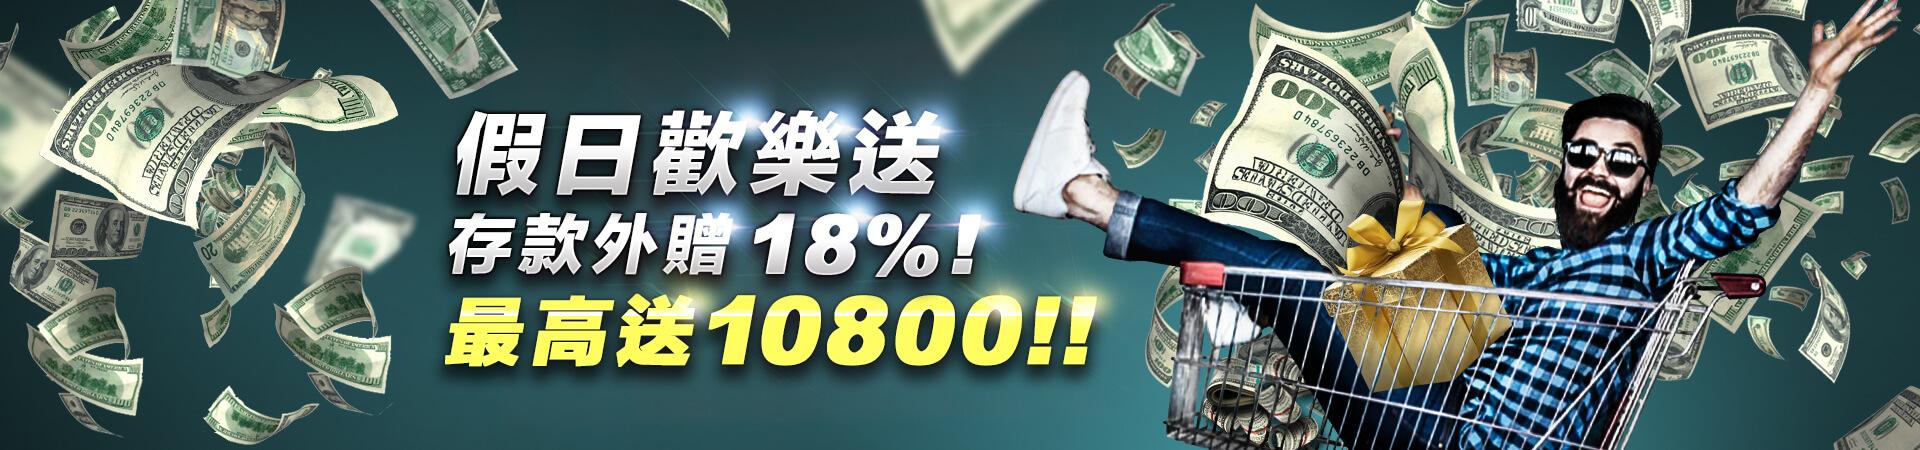 HOYA娛樂城週末歡樂送!存款加贈18%~天天狂送10800!